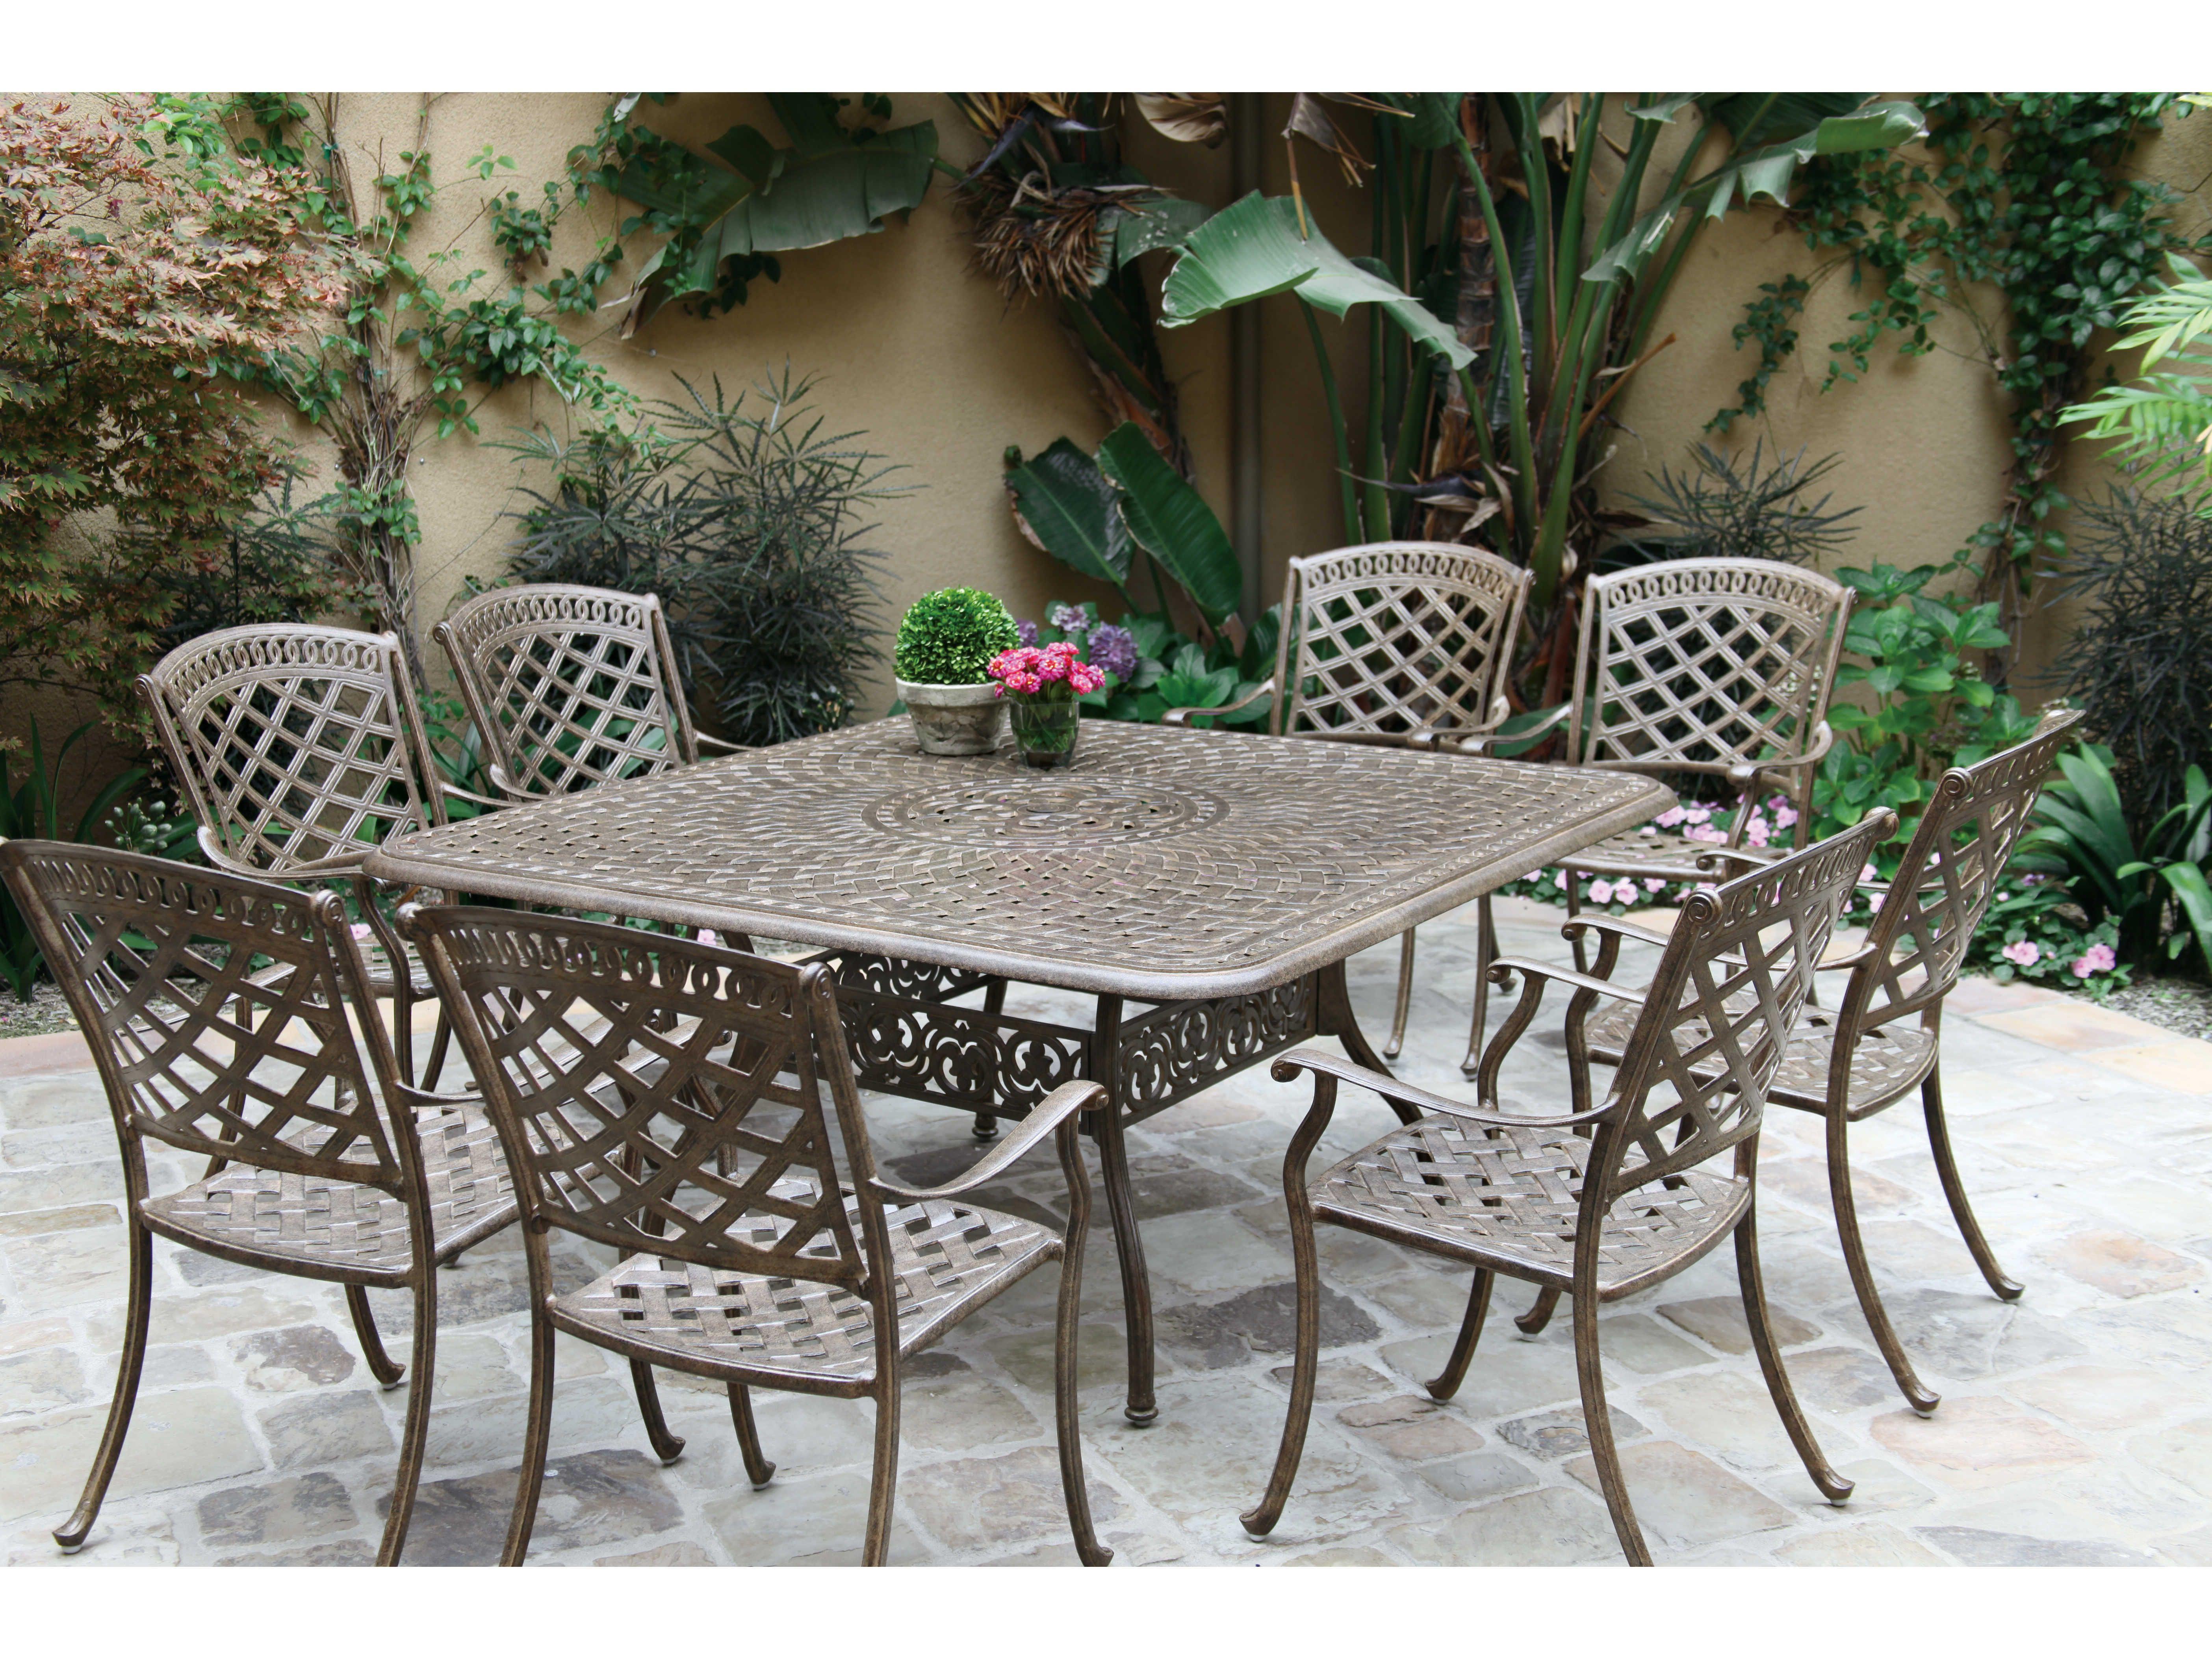 Swell Darlee Outdoor Living Standard Sedona Cast Aluminum Dining Home Interior And Landscaping Mentranervesignezvosmurscom